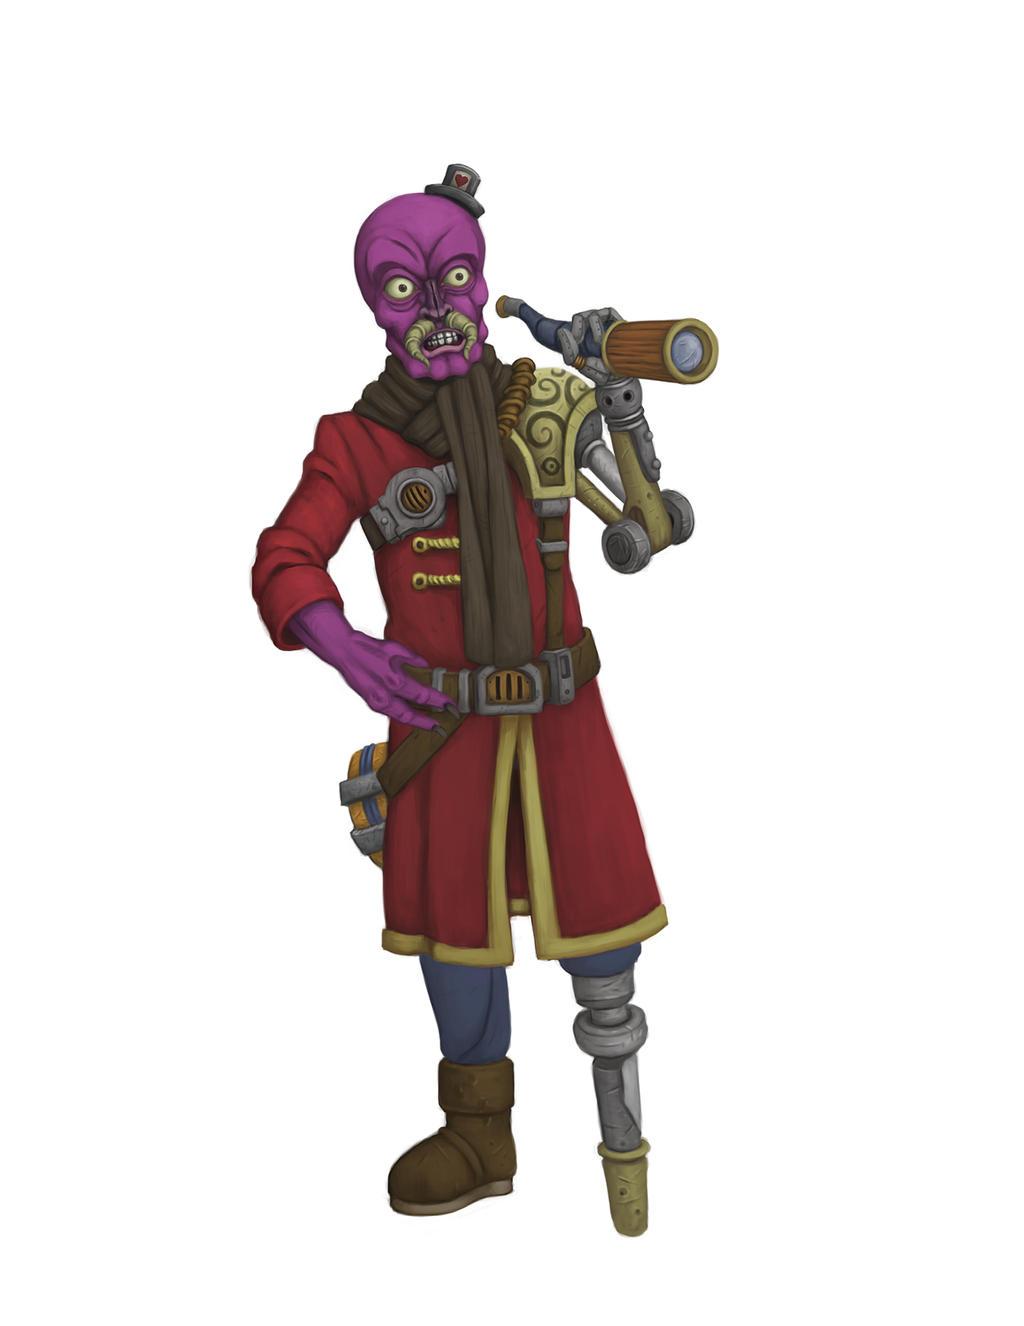 Captain Bugbeard